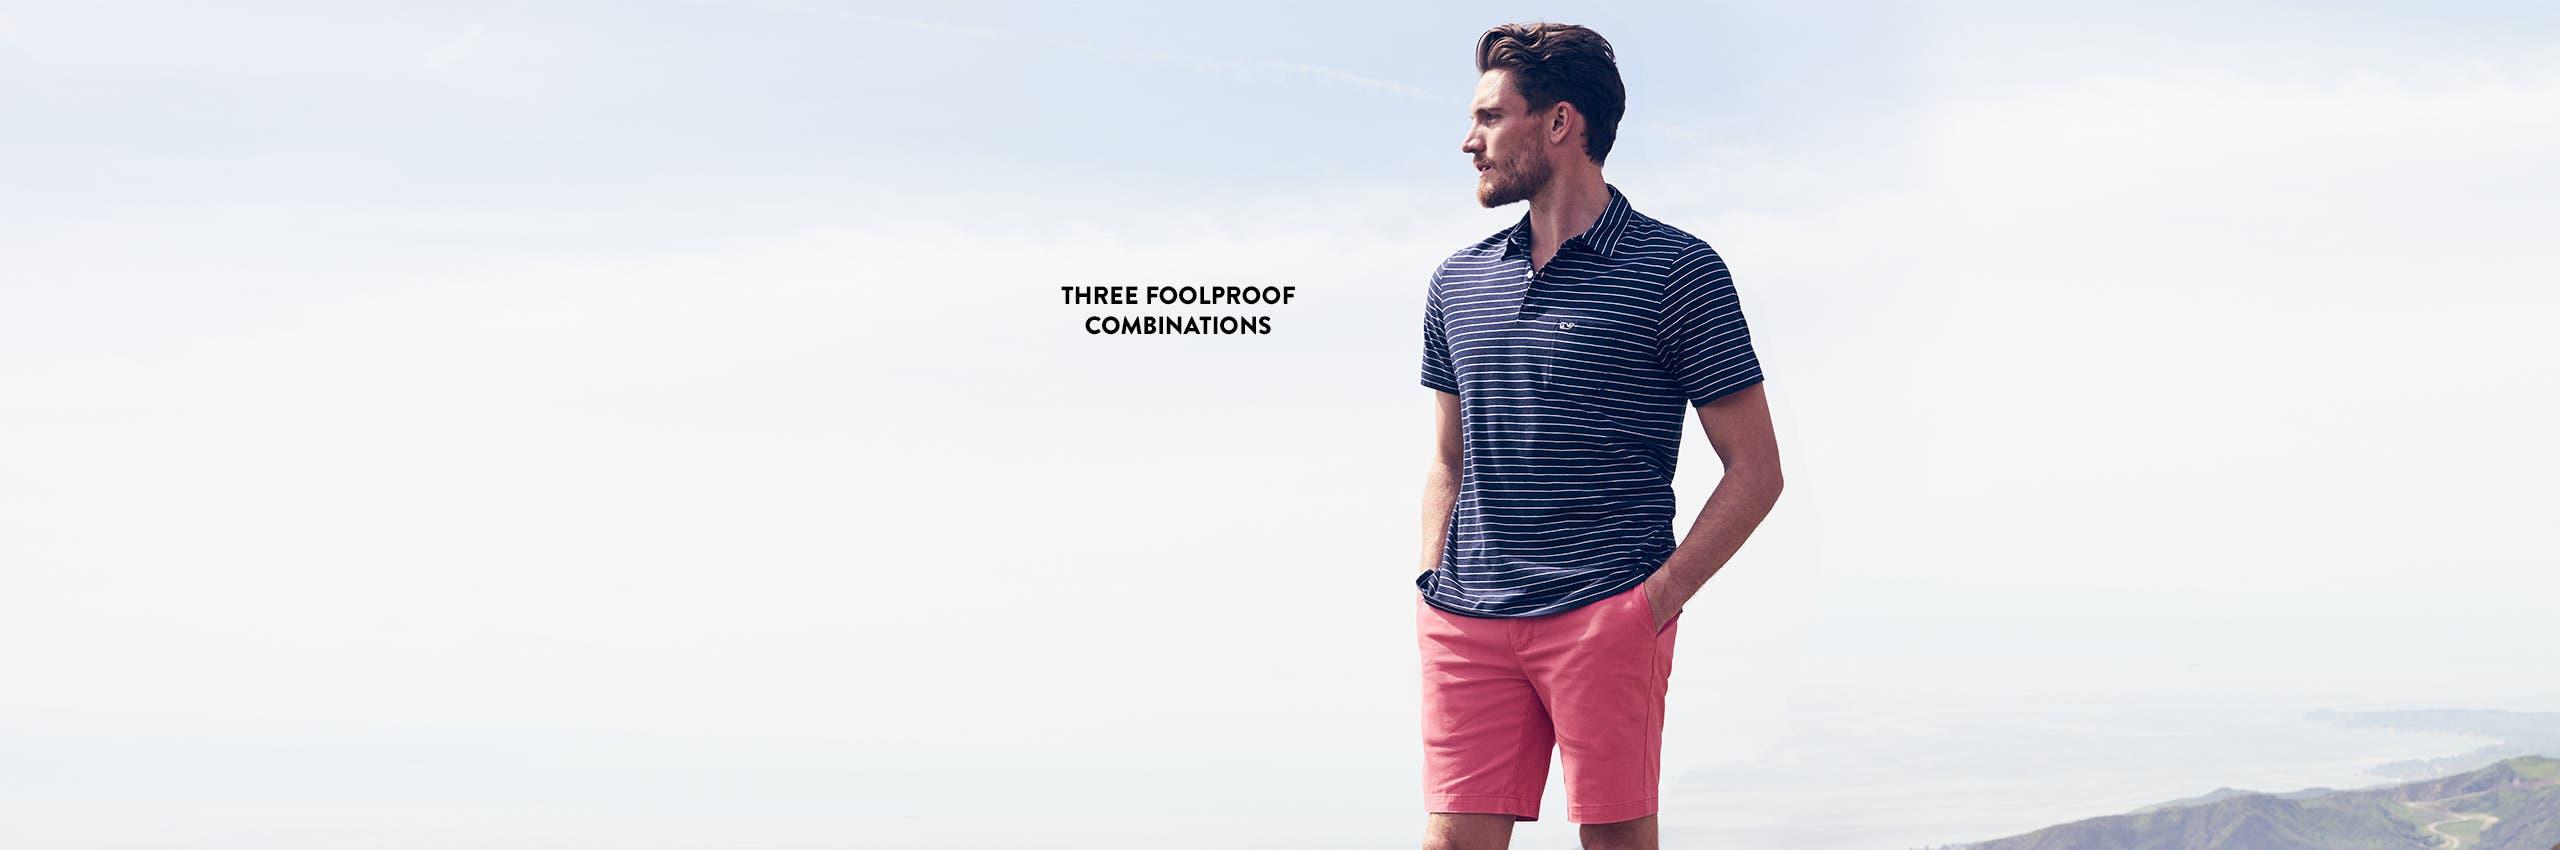 Three foolproof combinations: shorts & polos.